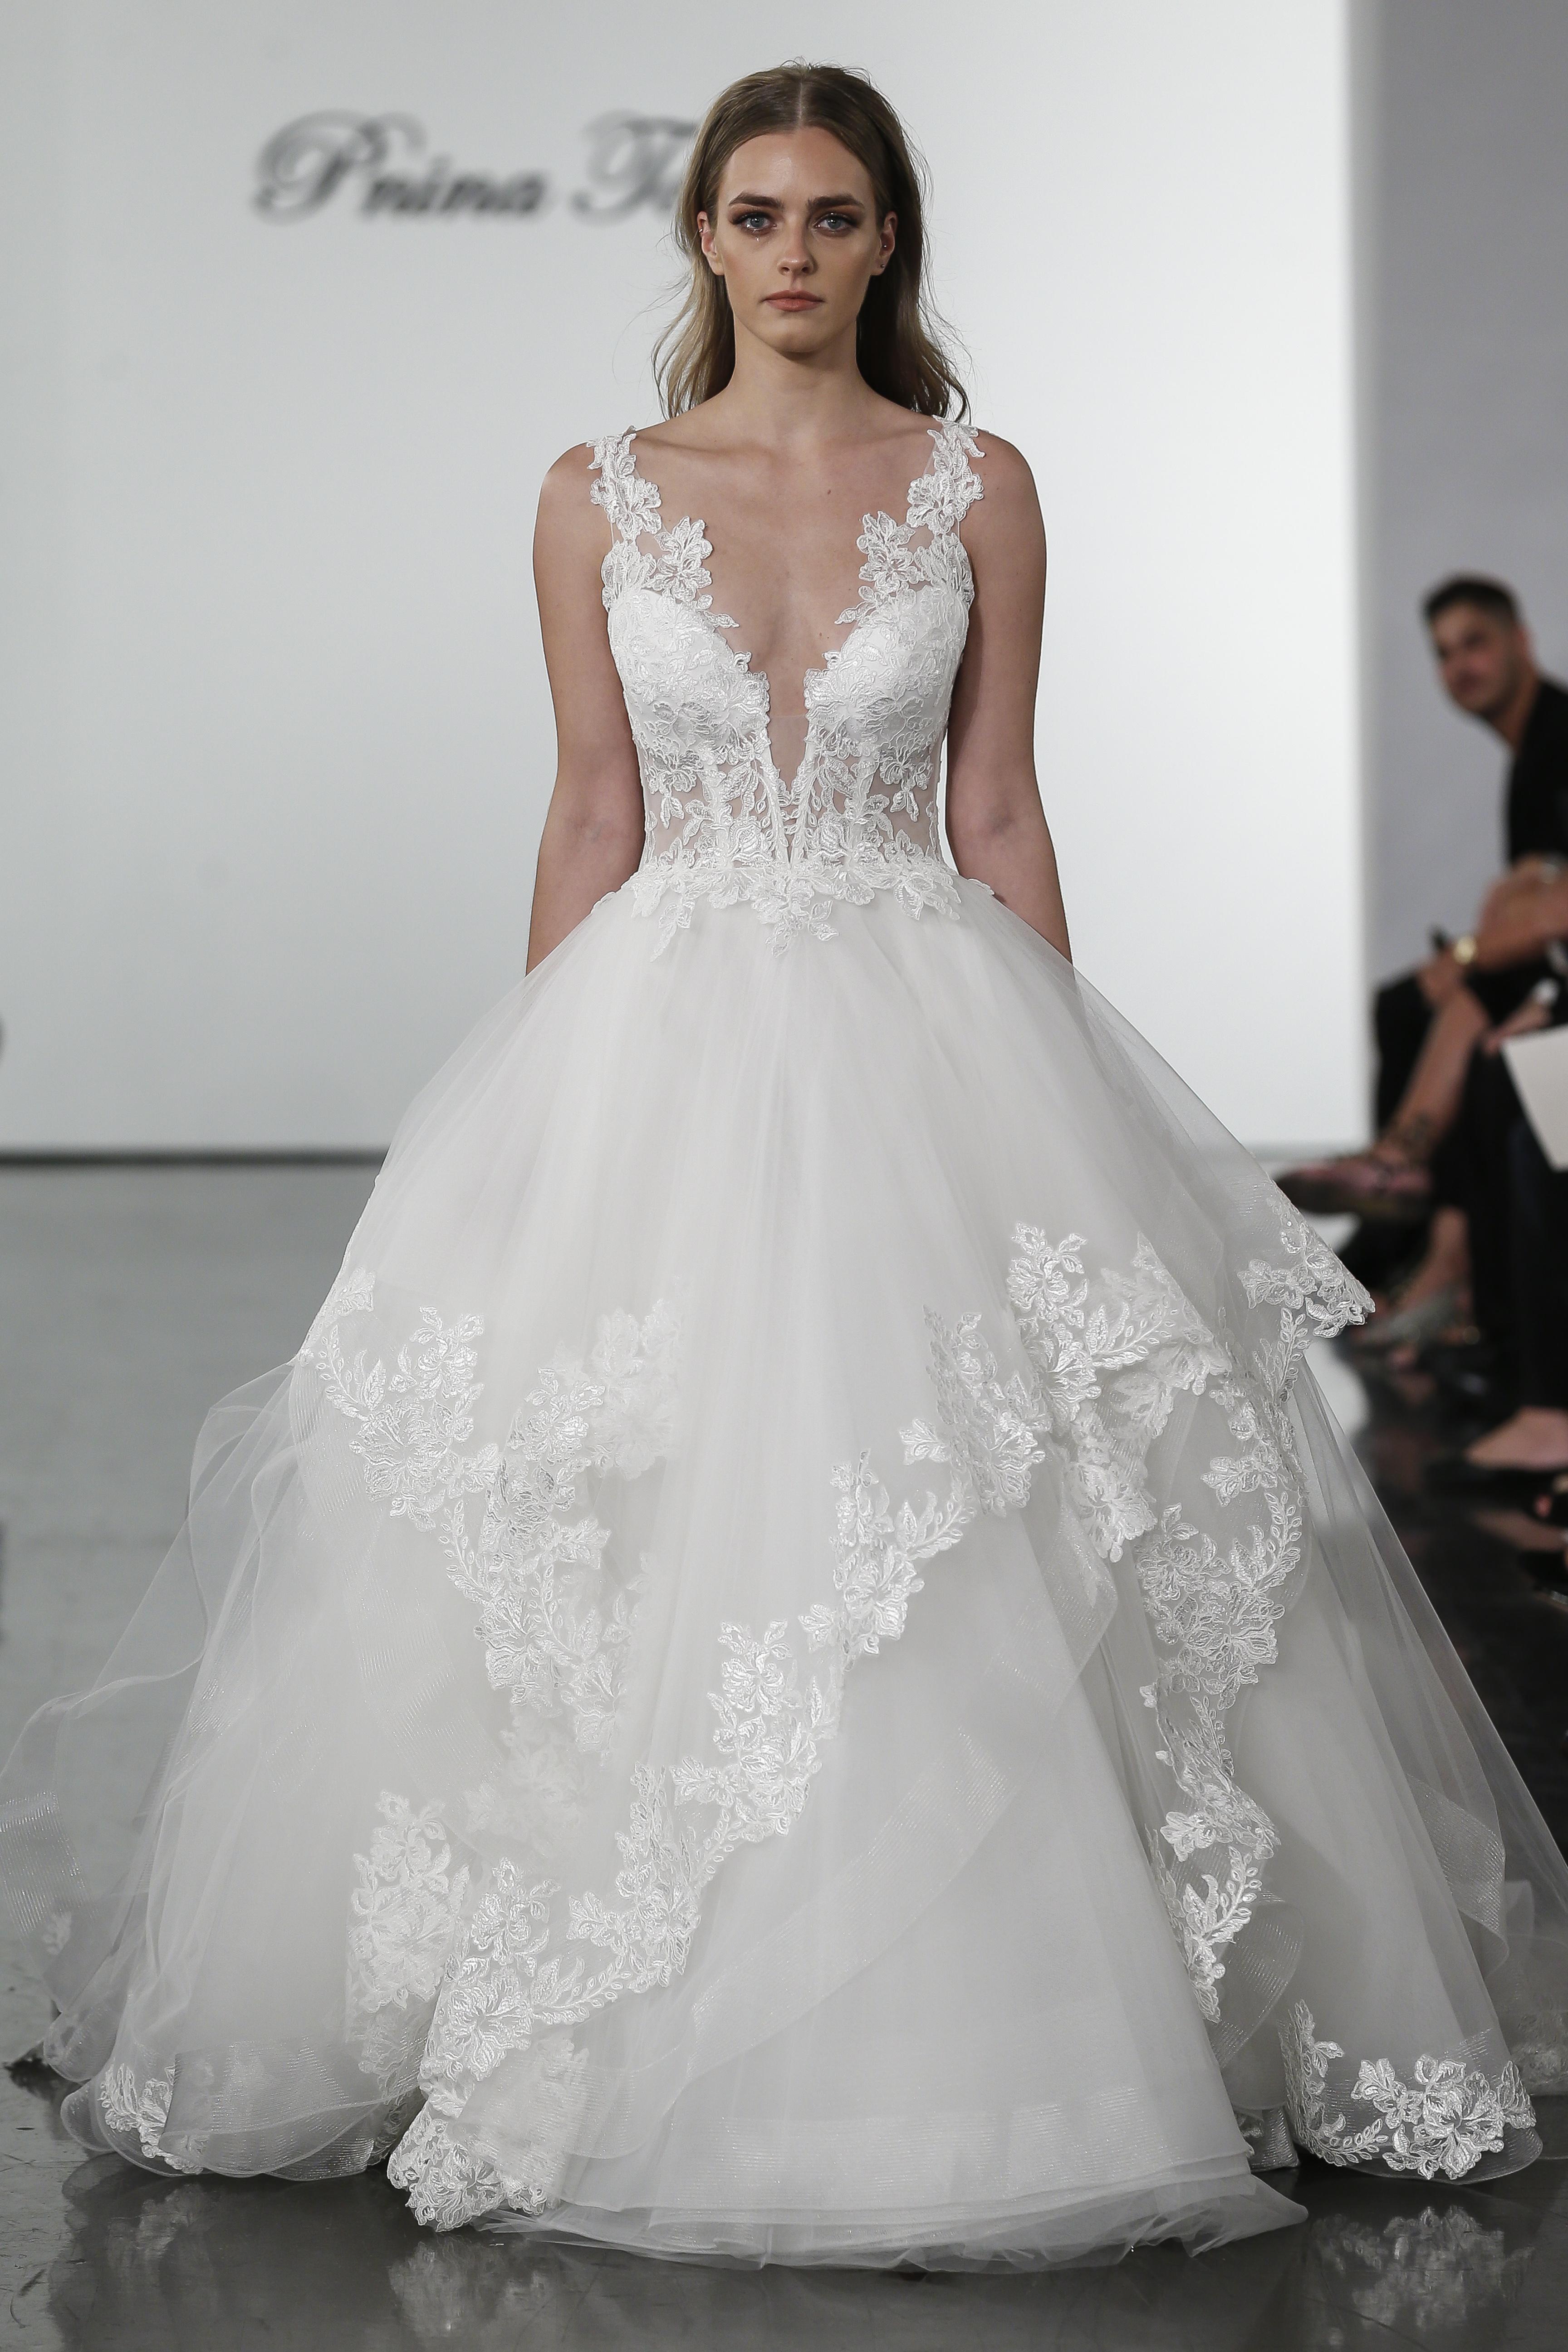 3ae62b2f Plunging V-neckline Layered Tulle Skirt Ball Gown Wedding Dress | Kleinfeld  Bridal